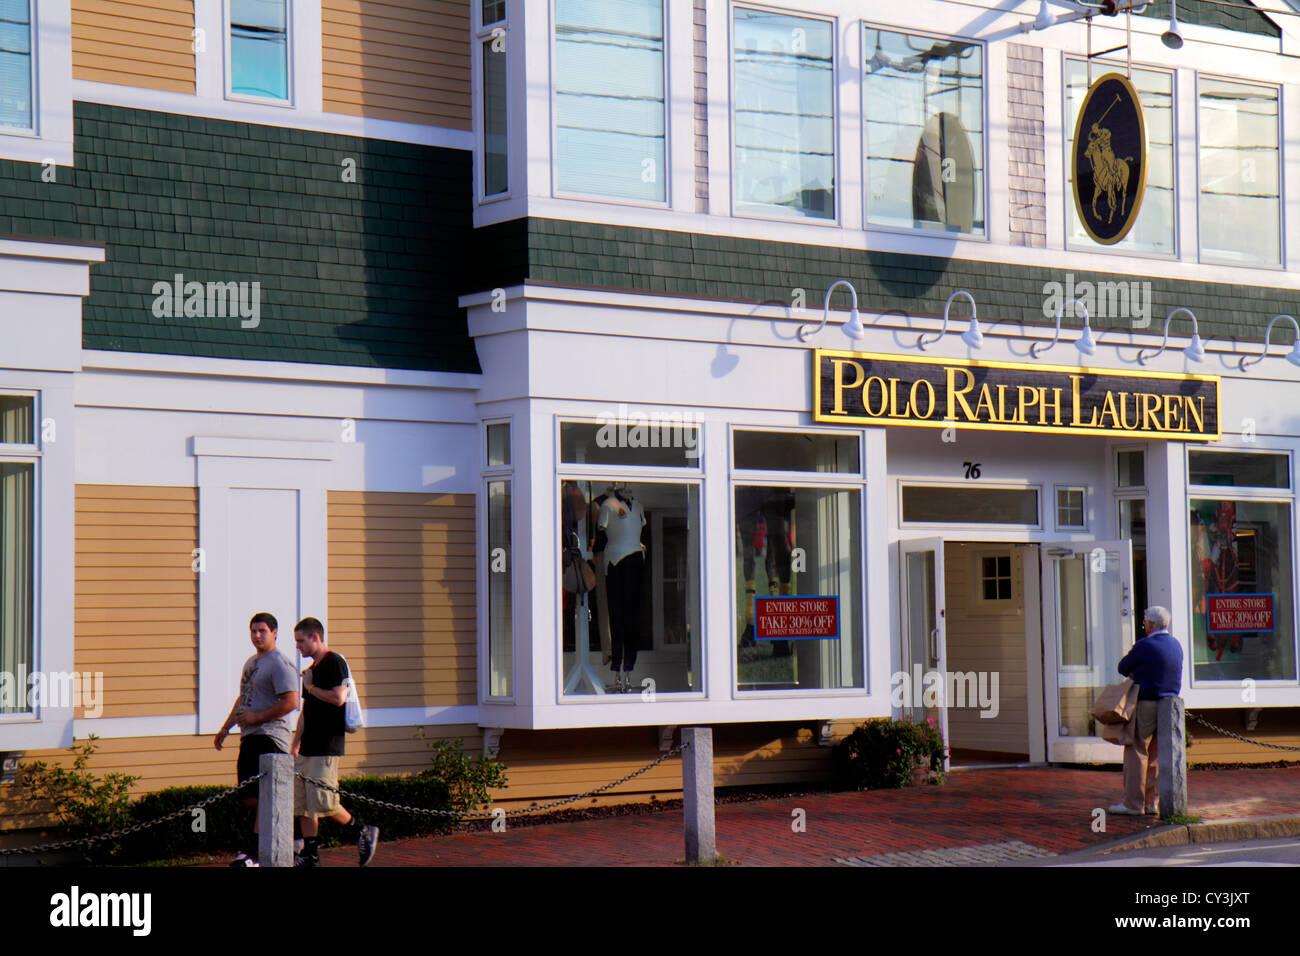 Maine Freeport Main Street Route 1 Einkaufen Polo Ralph Lauren Kleidung  Mode Outlet vor dem Eingang a311a23e4c